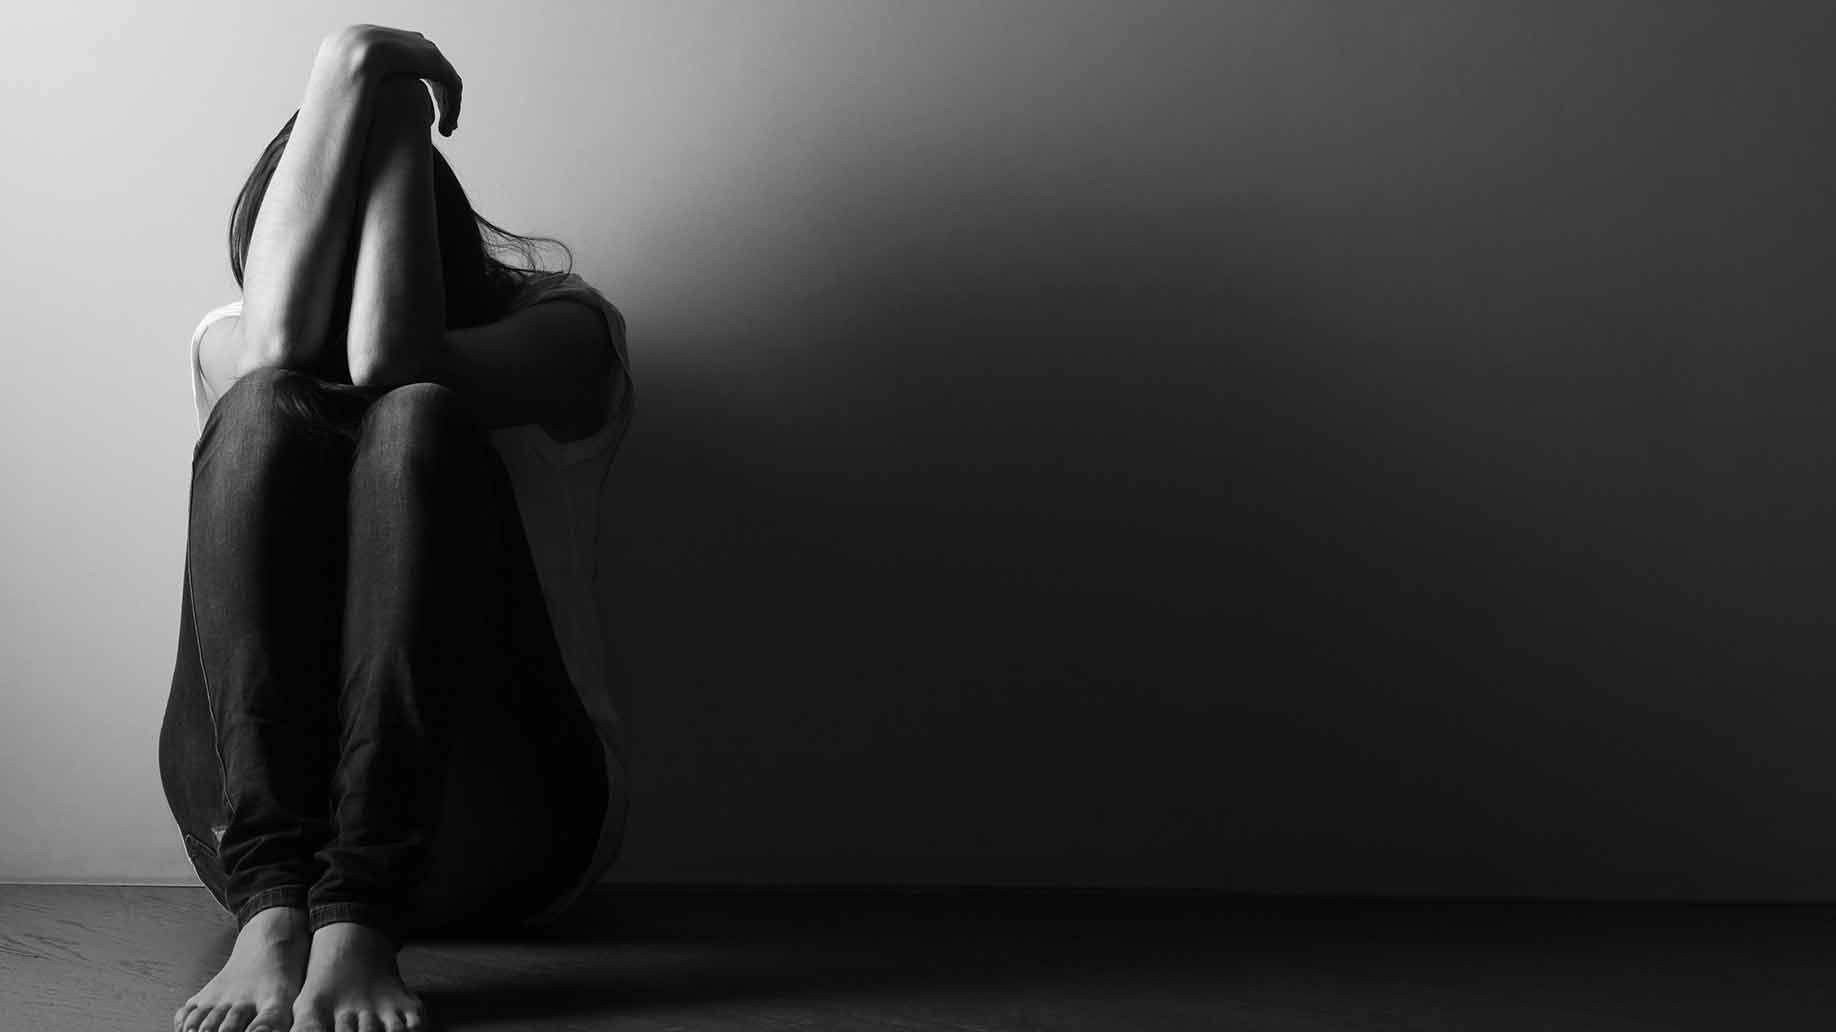 Depression Anxiety Alone Sad Depressed Dark Turmeric